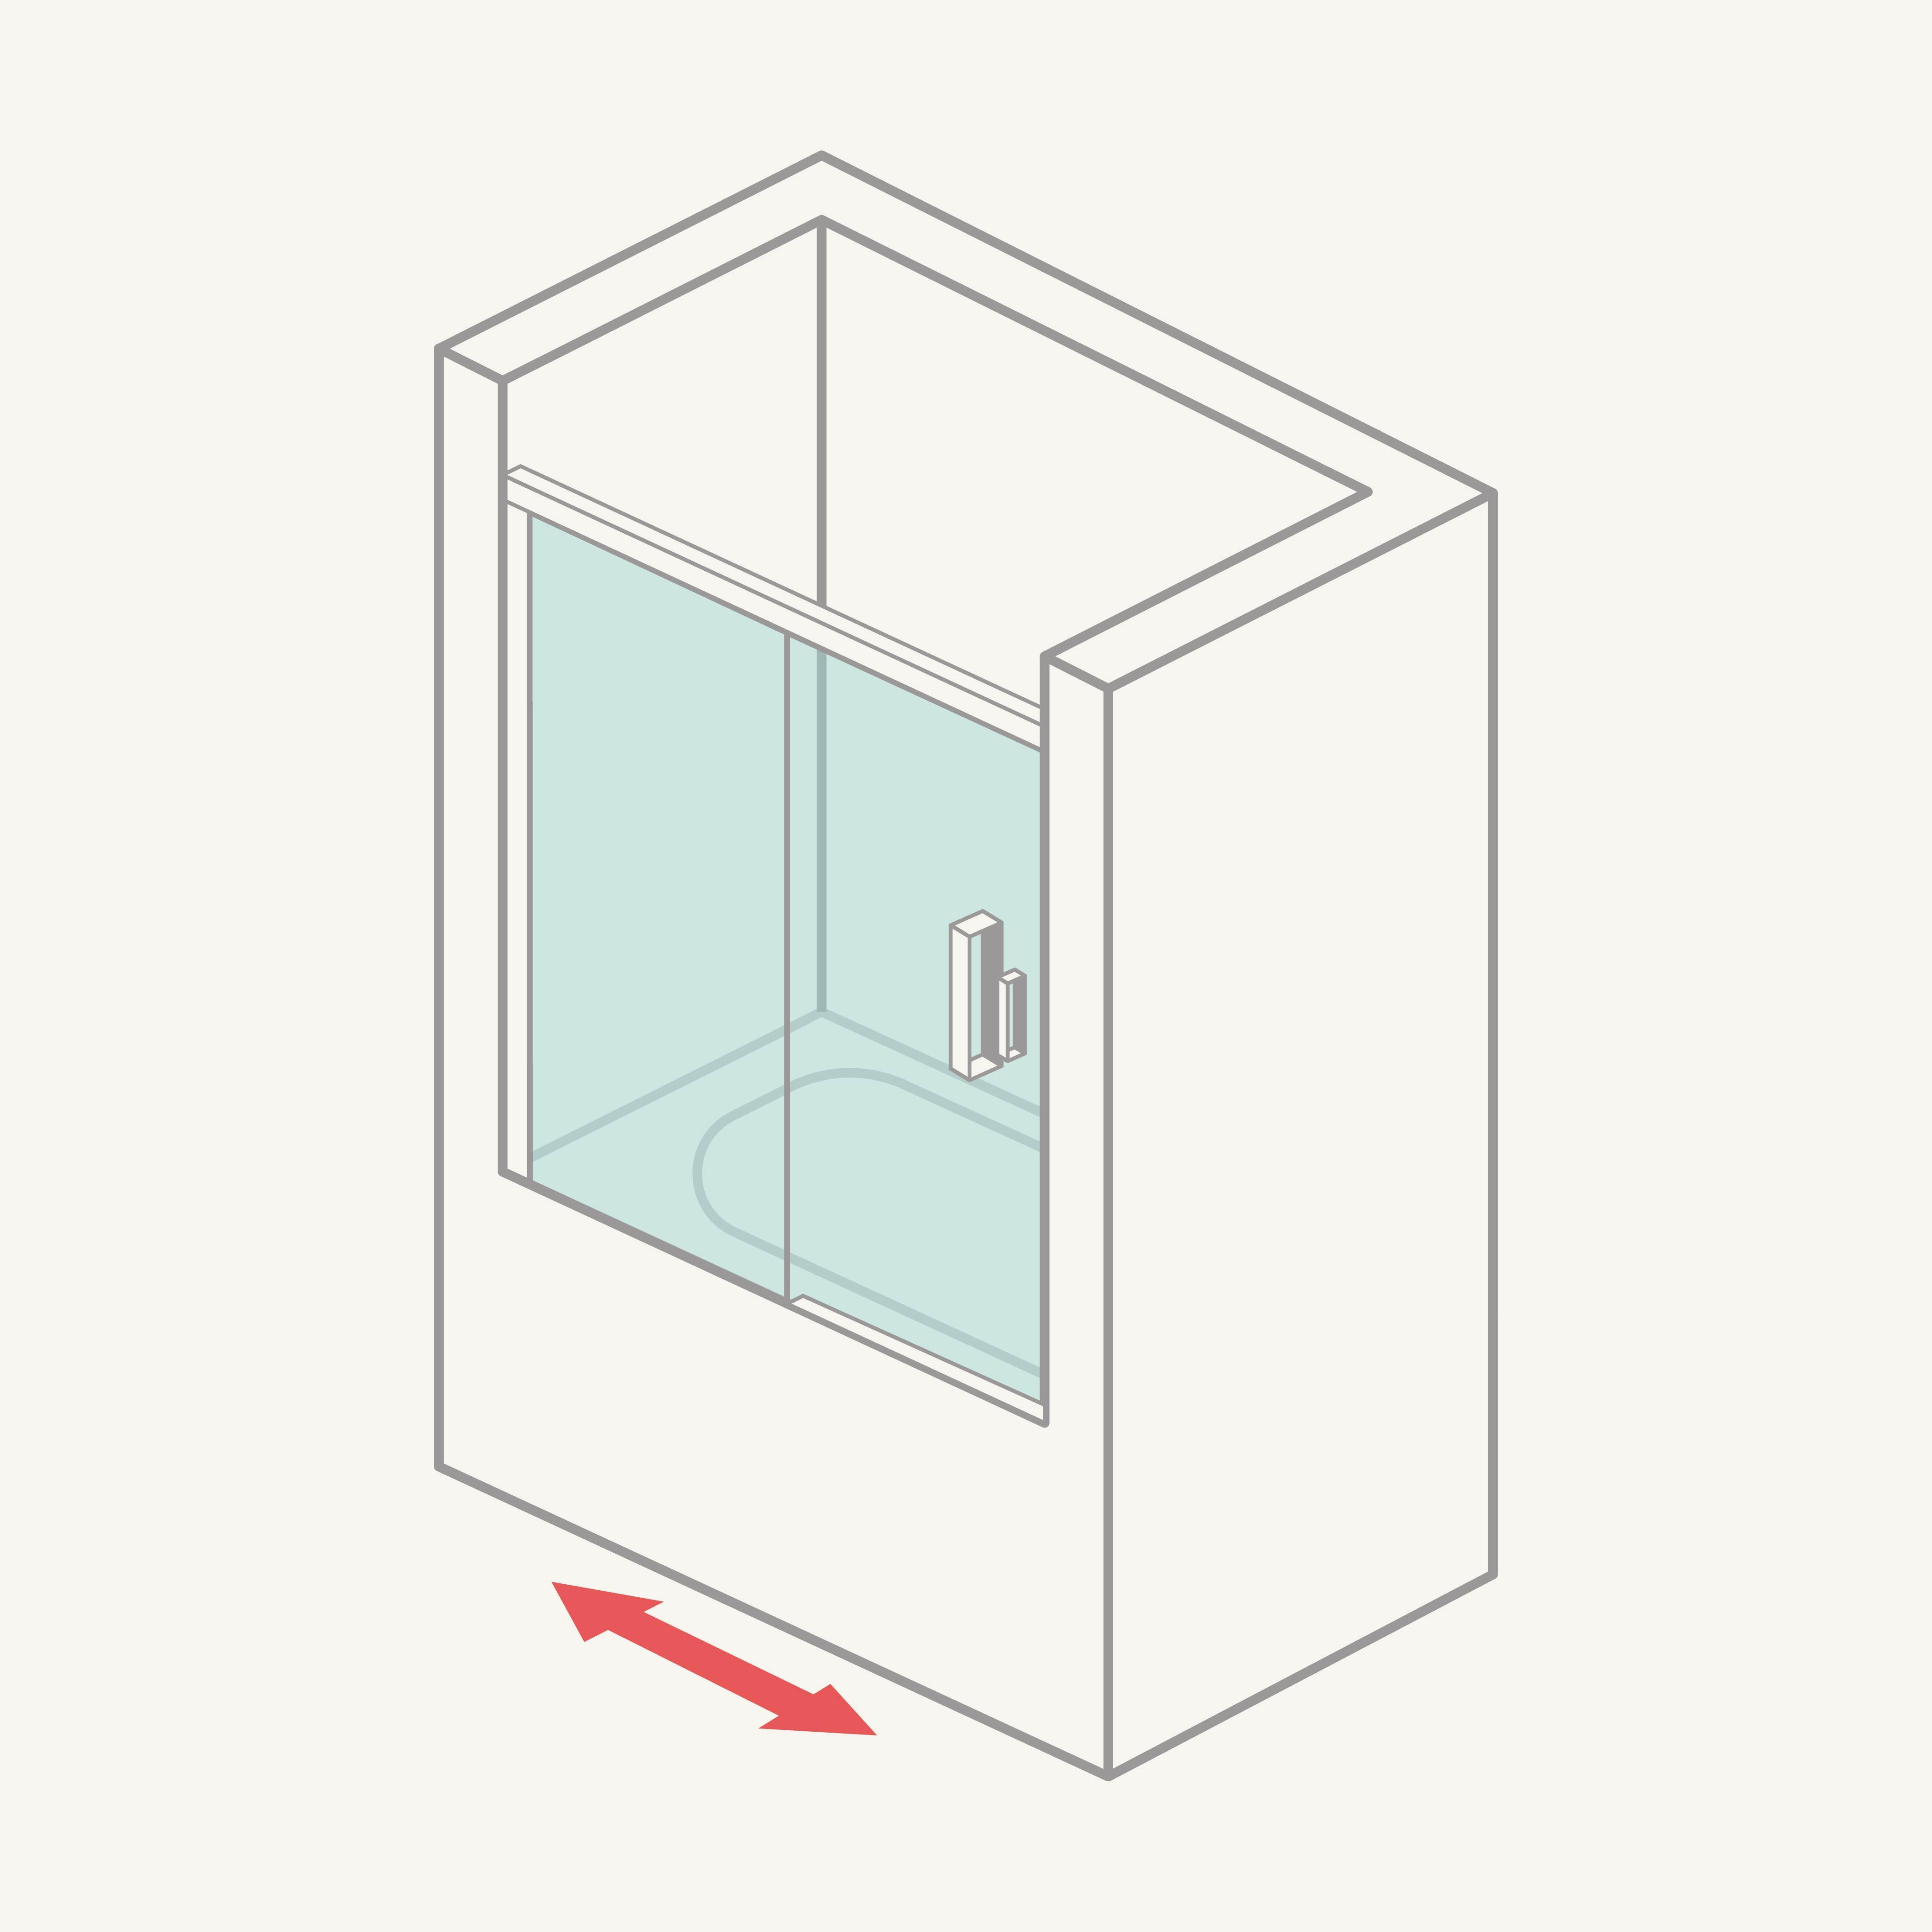 Mamparadebañerafrontal(1fija+1corredera)